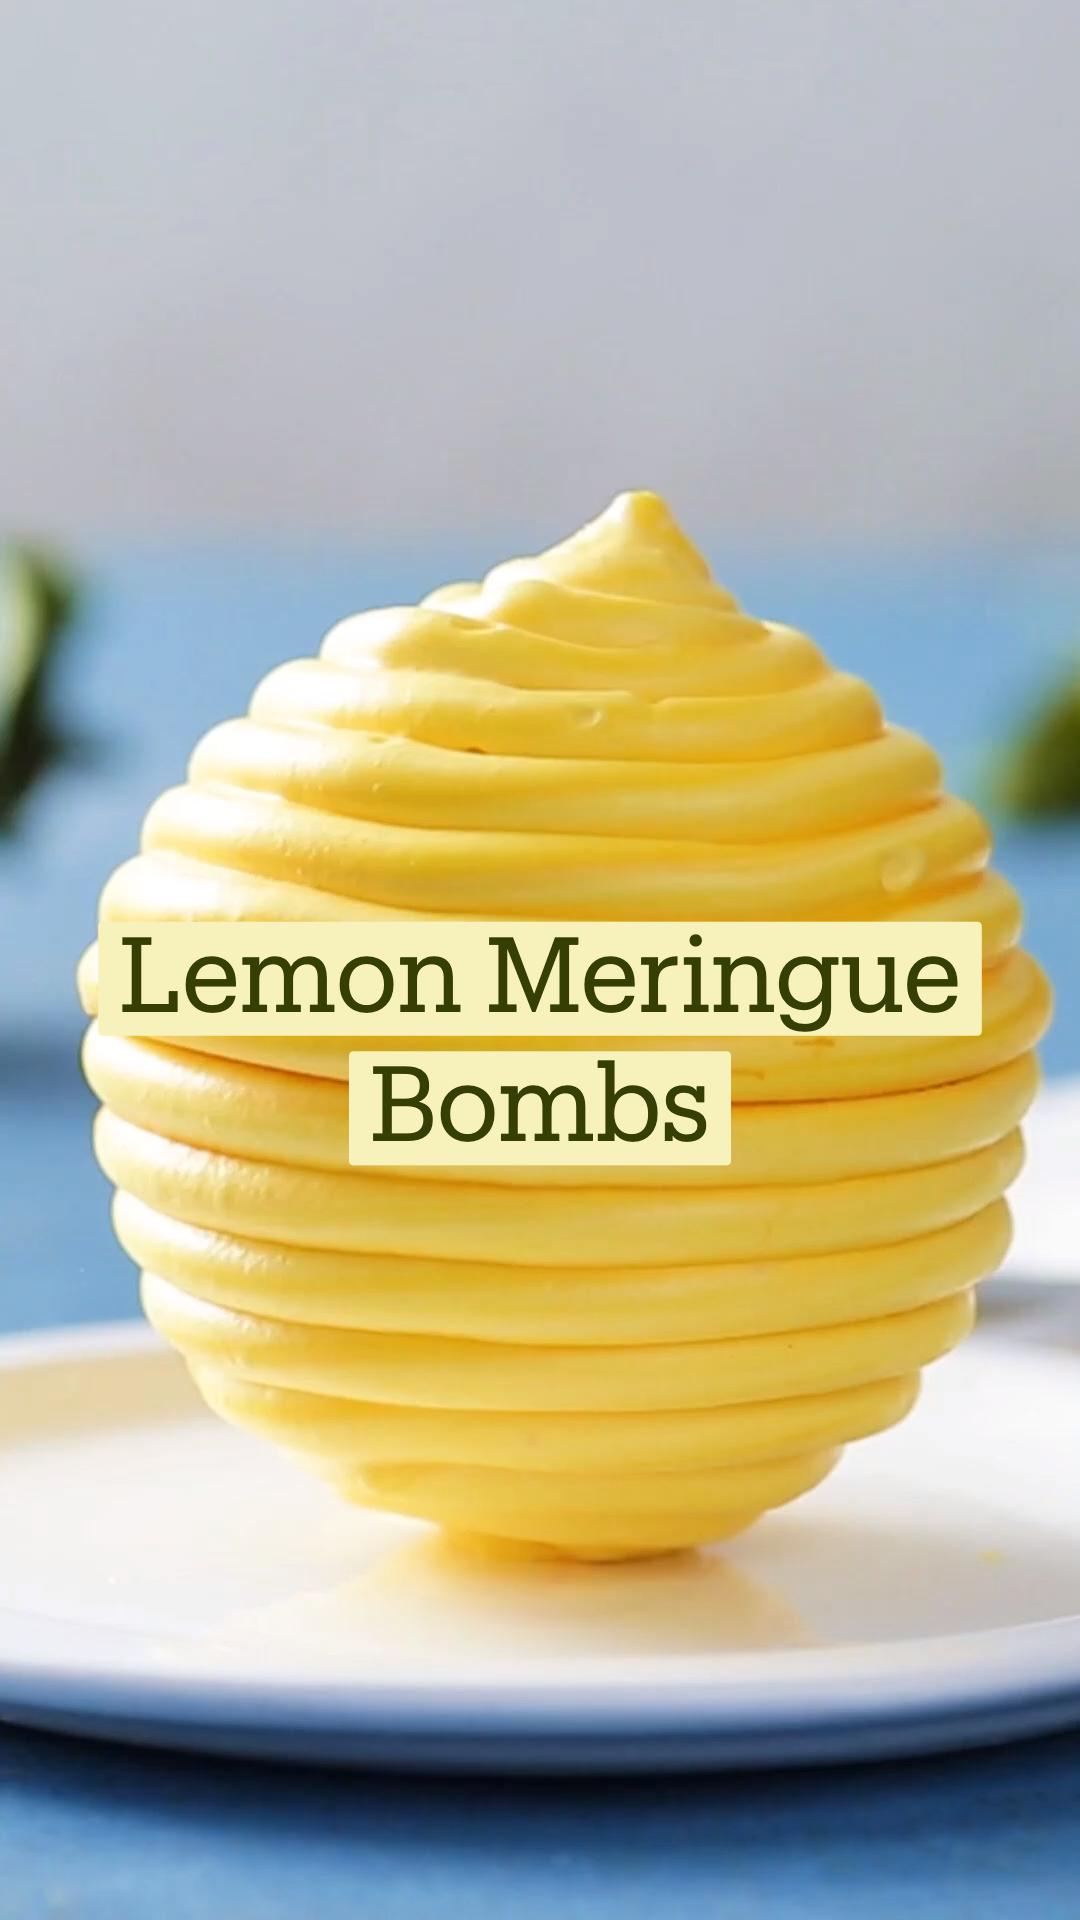 Lemon Meringue Bombs